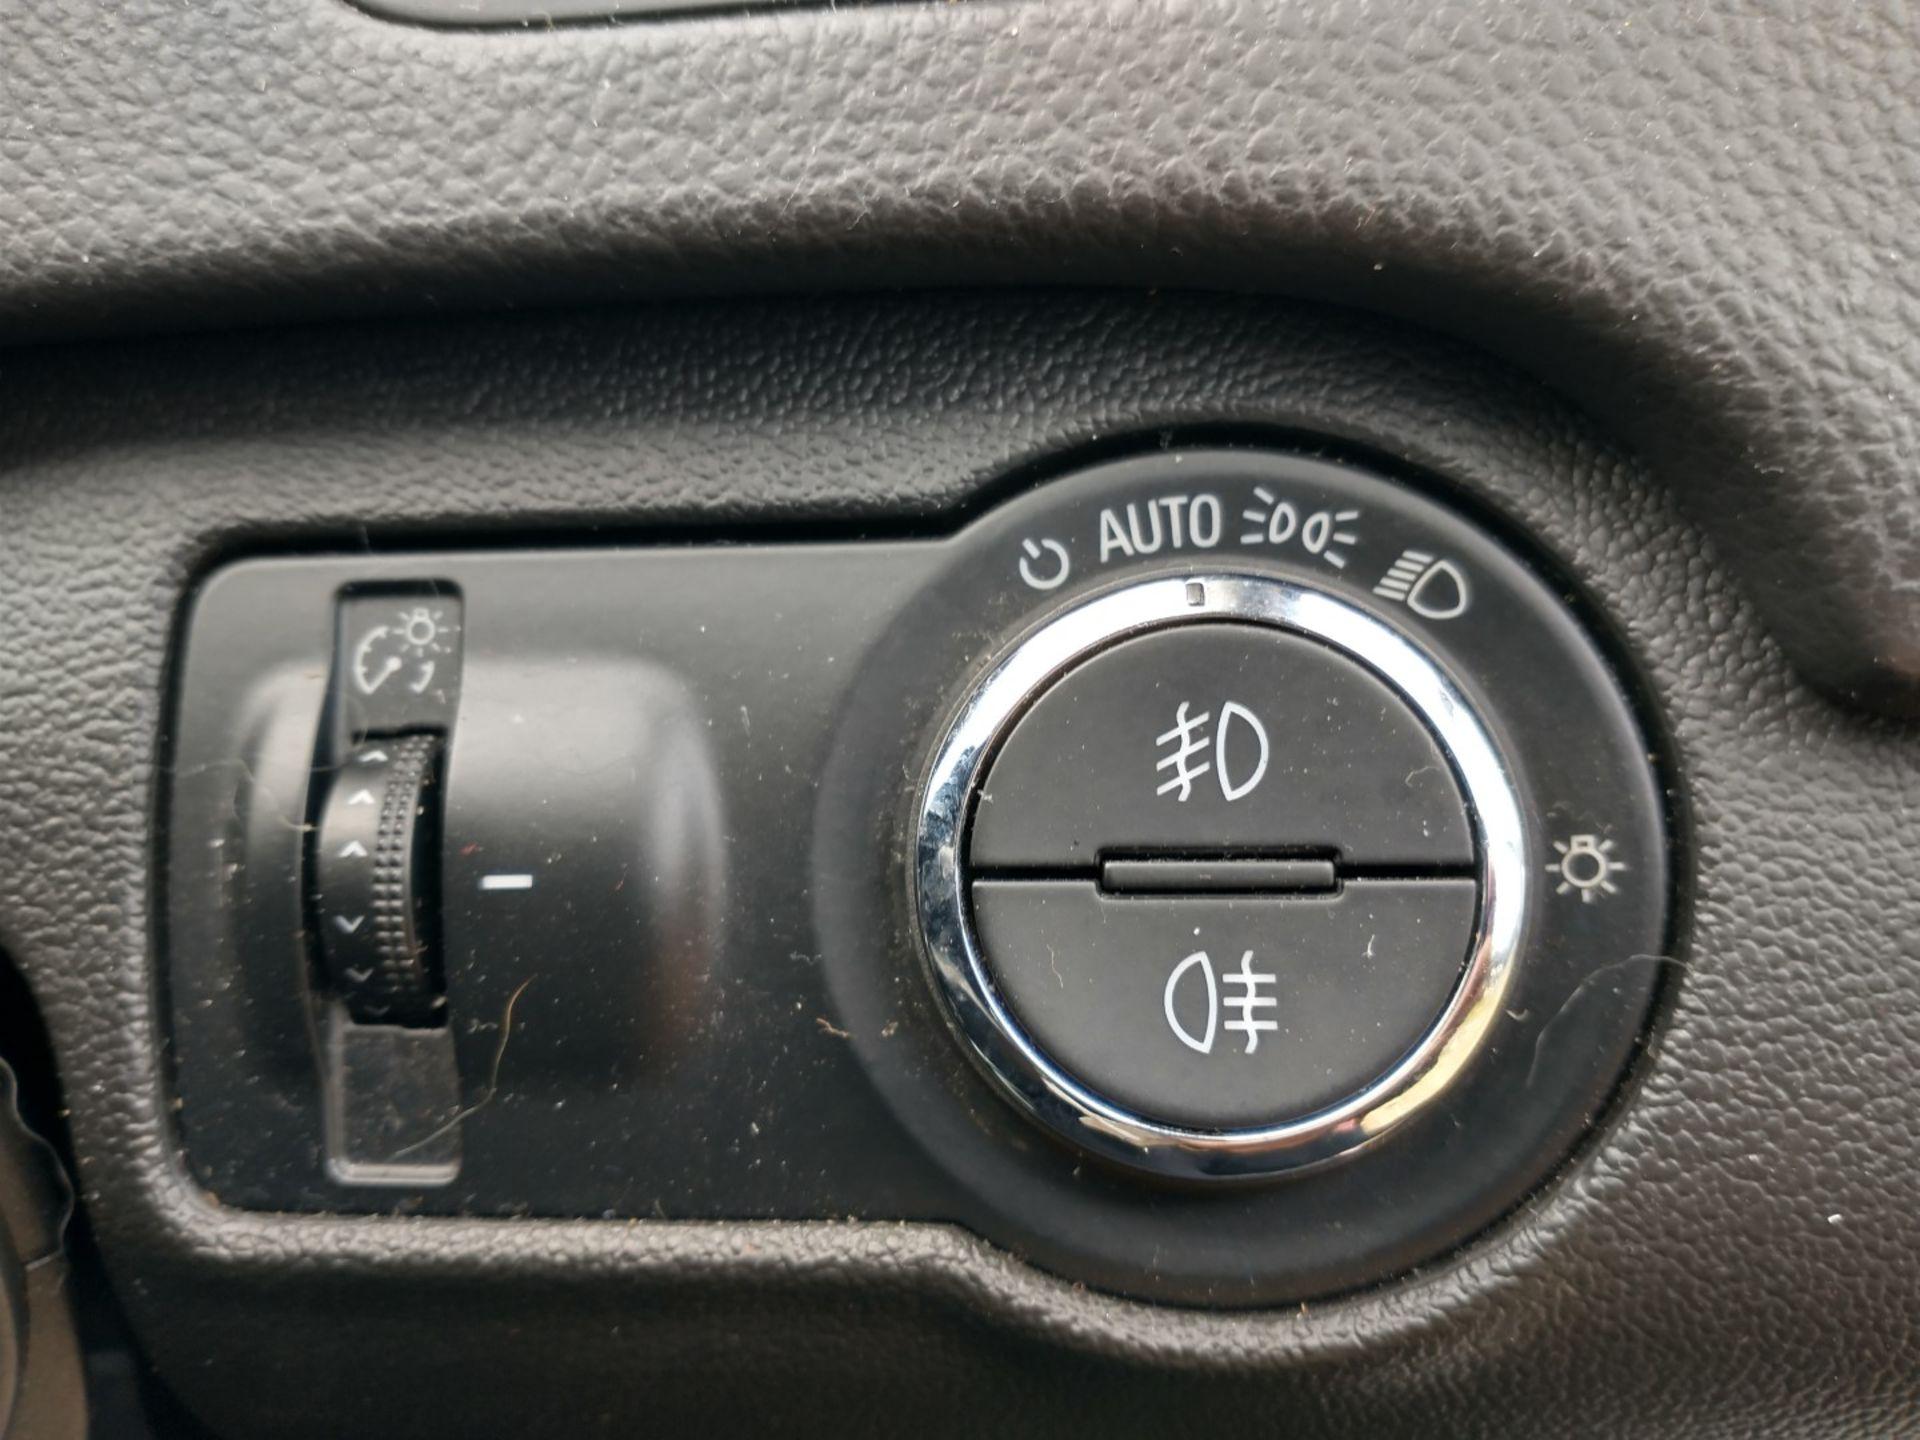 2009 Vauxhall Insignia Elite Nav CDTI 5dr 2.0 Diesel - CL505 - NO VAT ON THE HAMMER - Location: Corb - Image 17 of 22